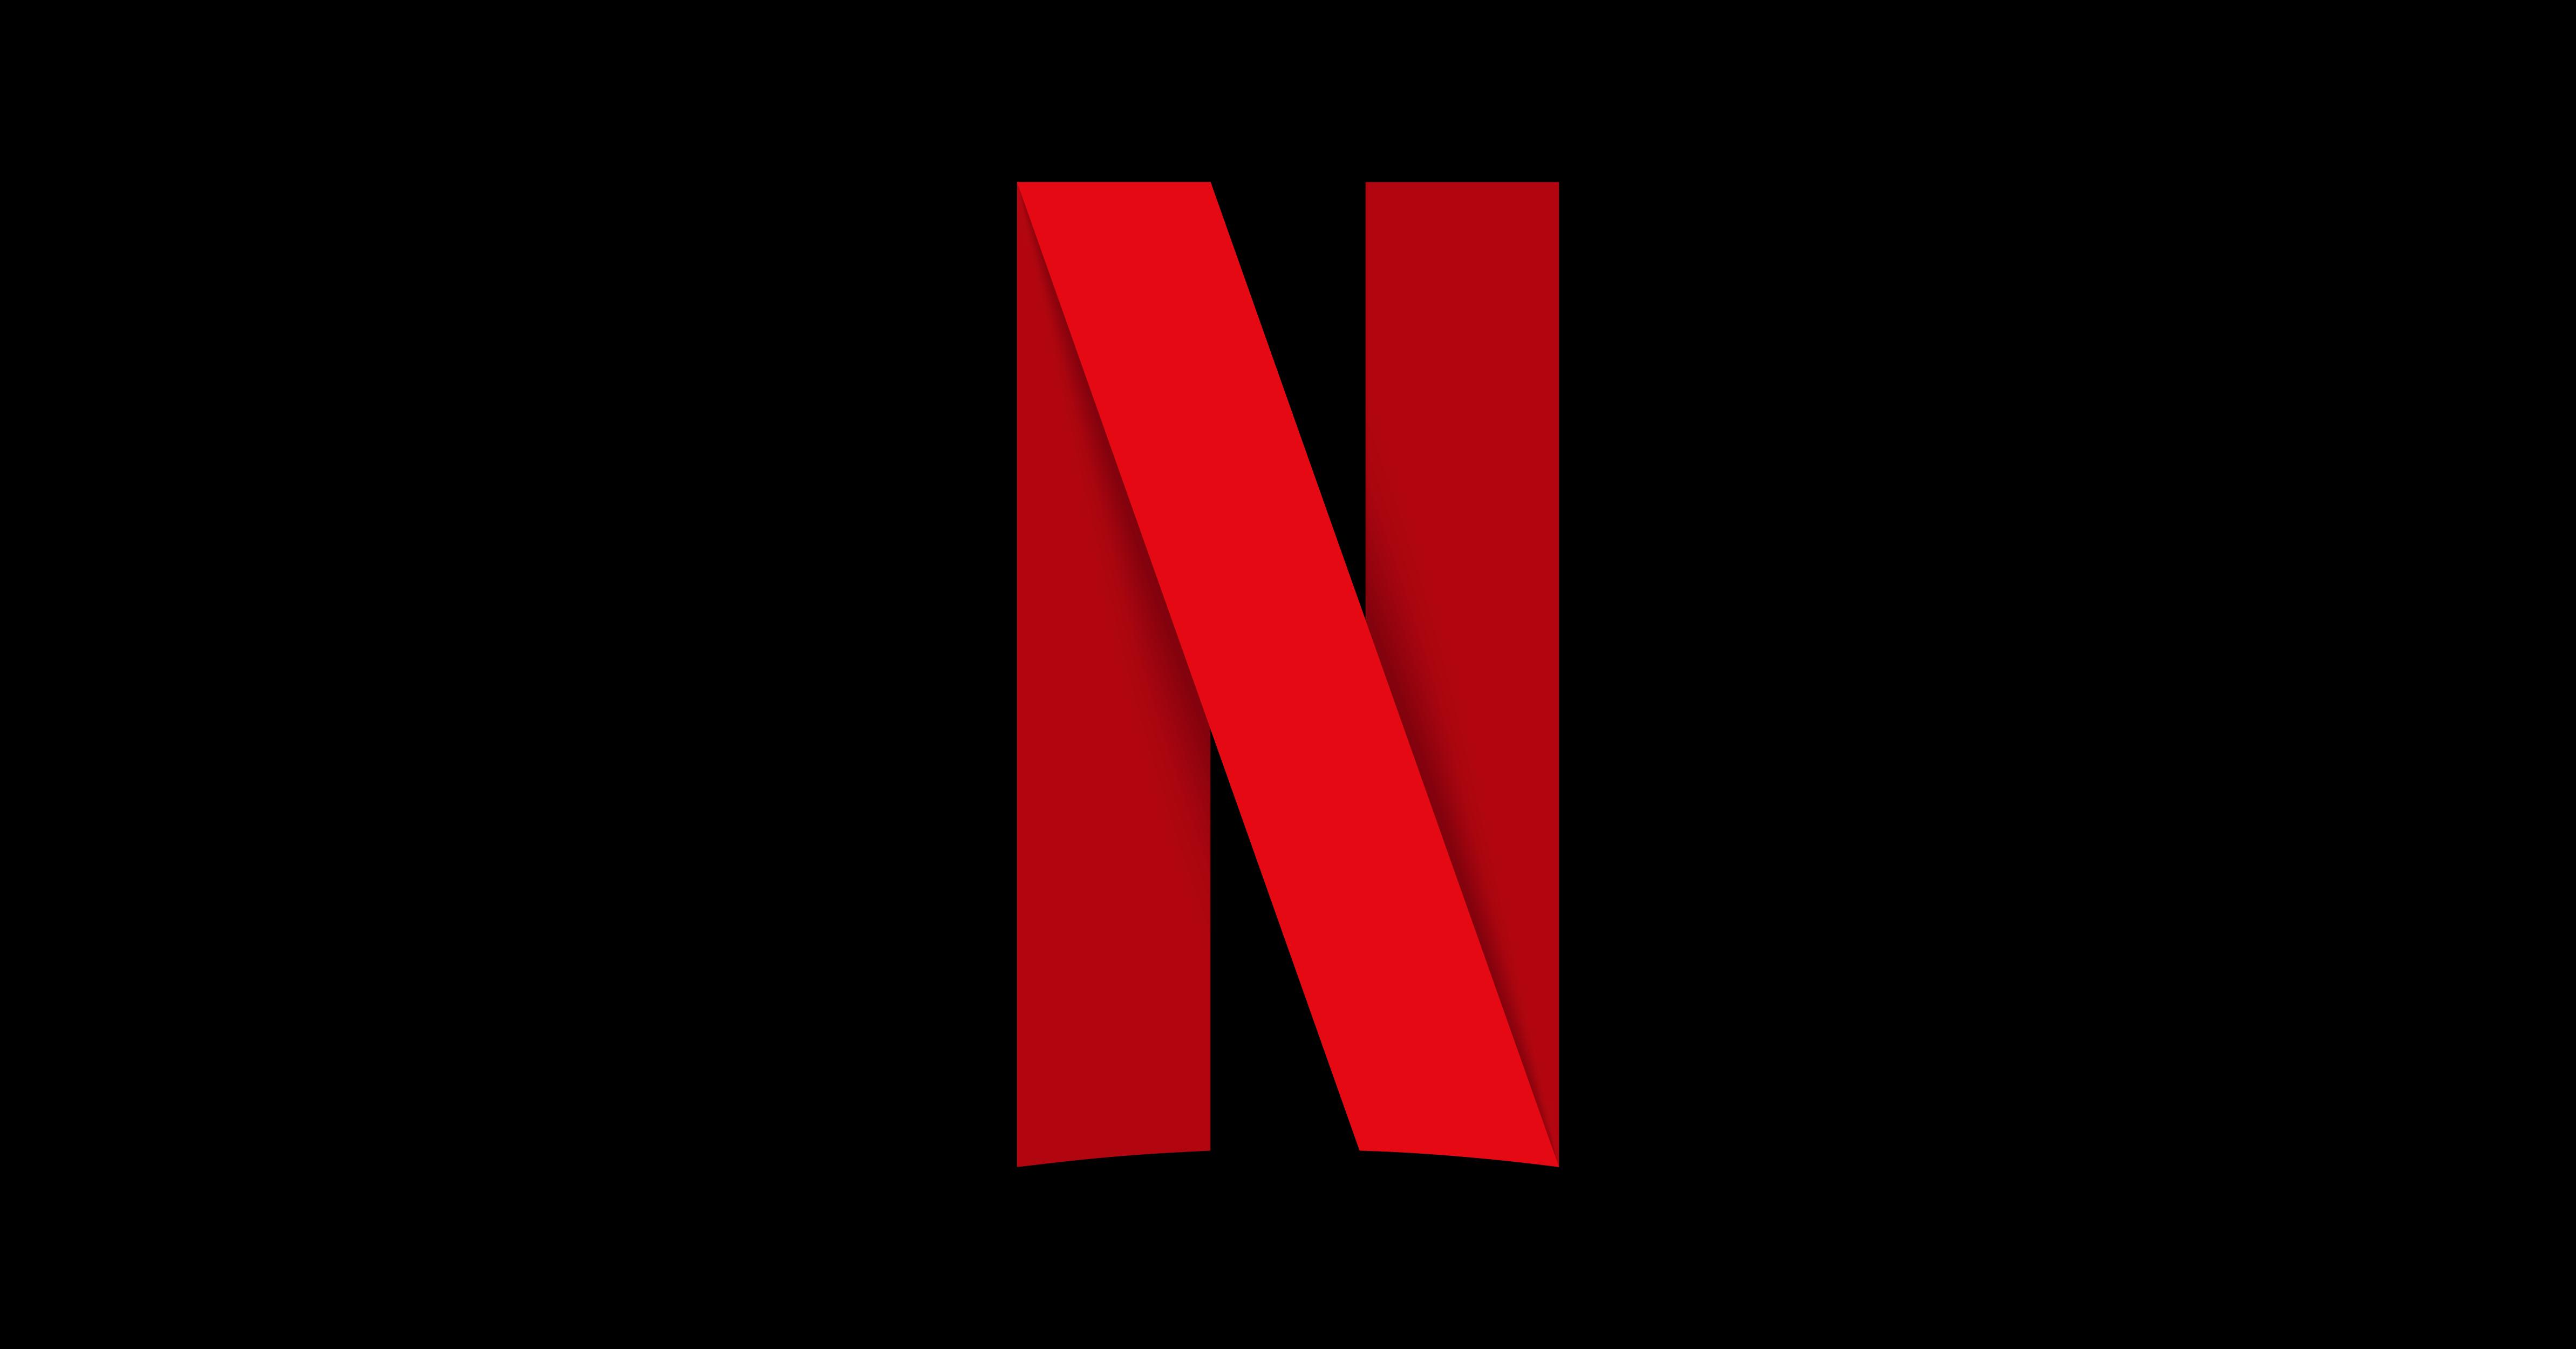 New Netflix Episodes